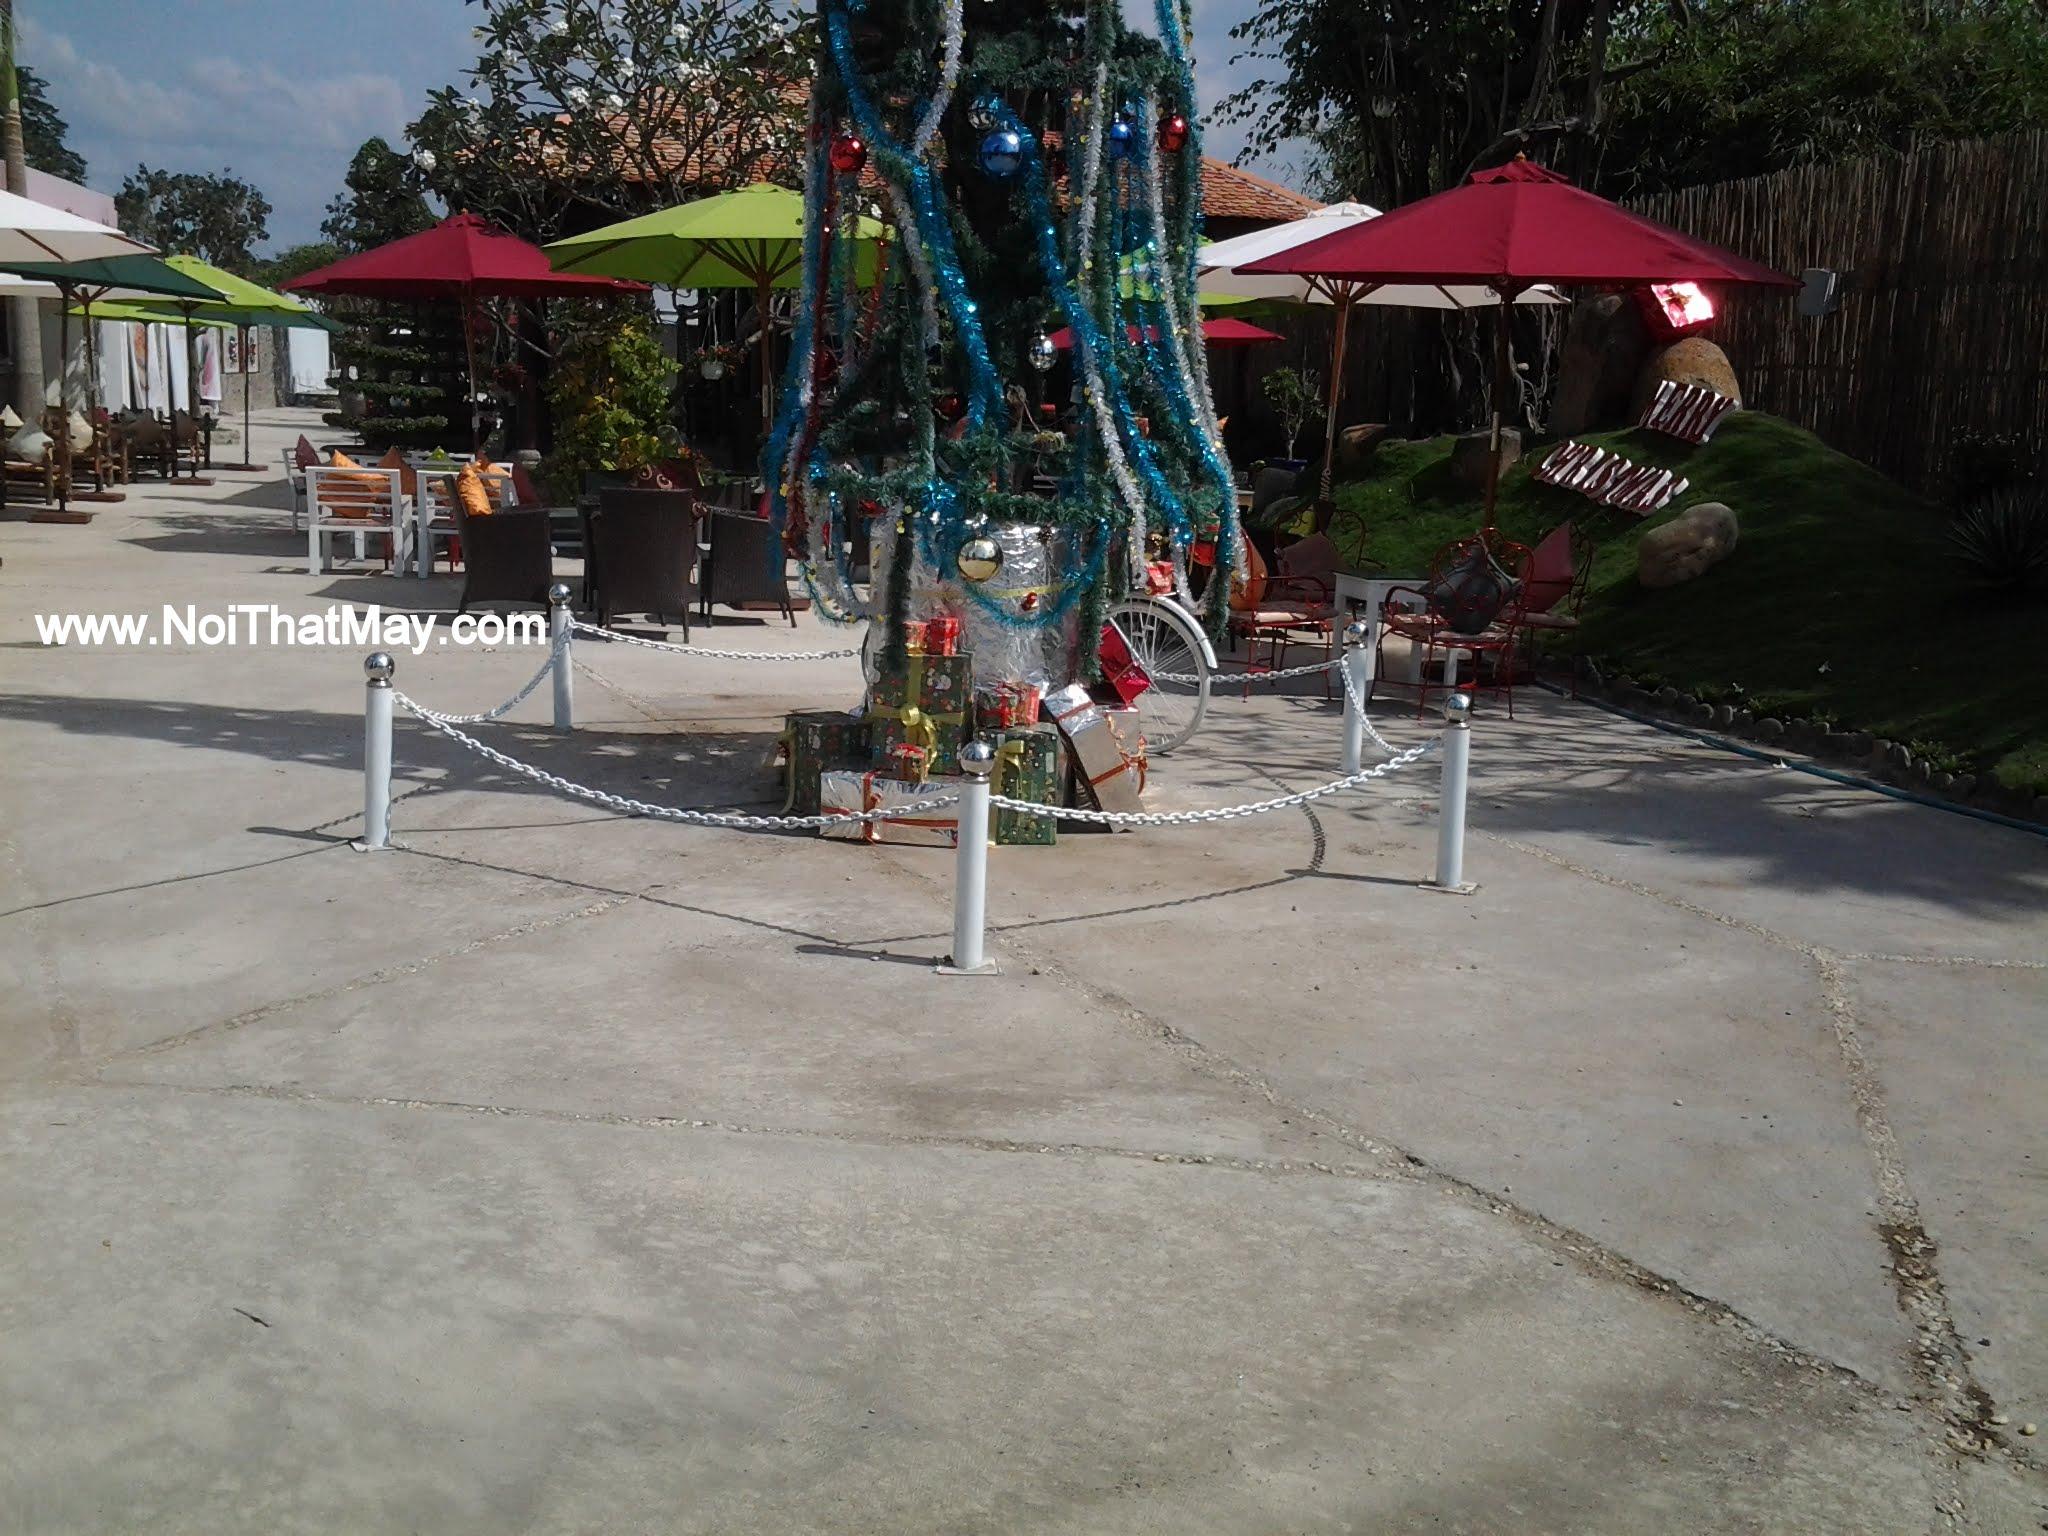 Outdoor wicker dining set Cafe Art Garden